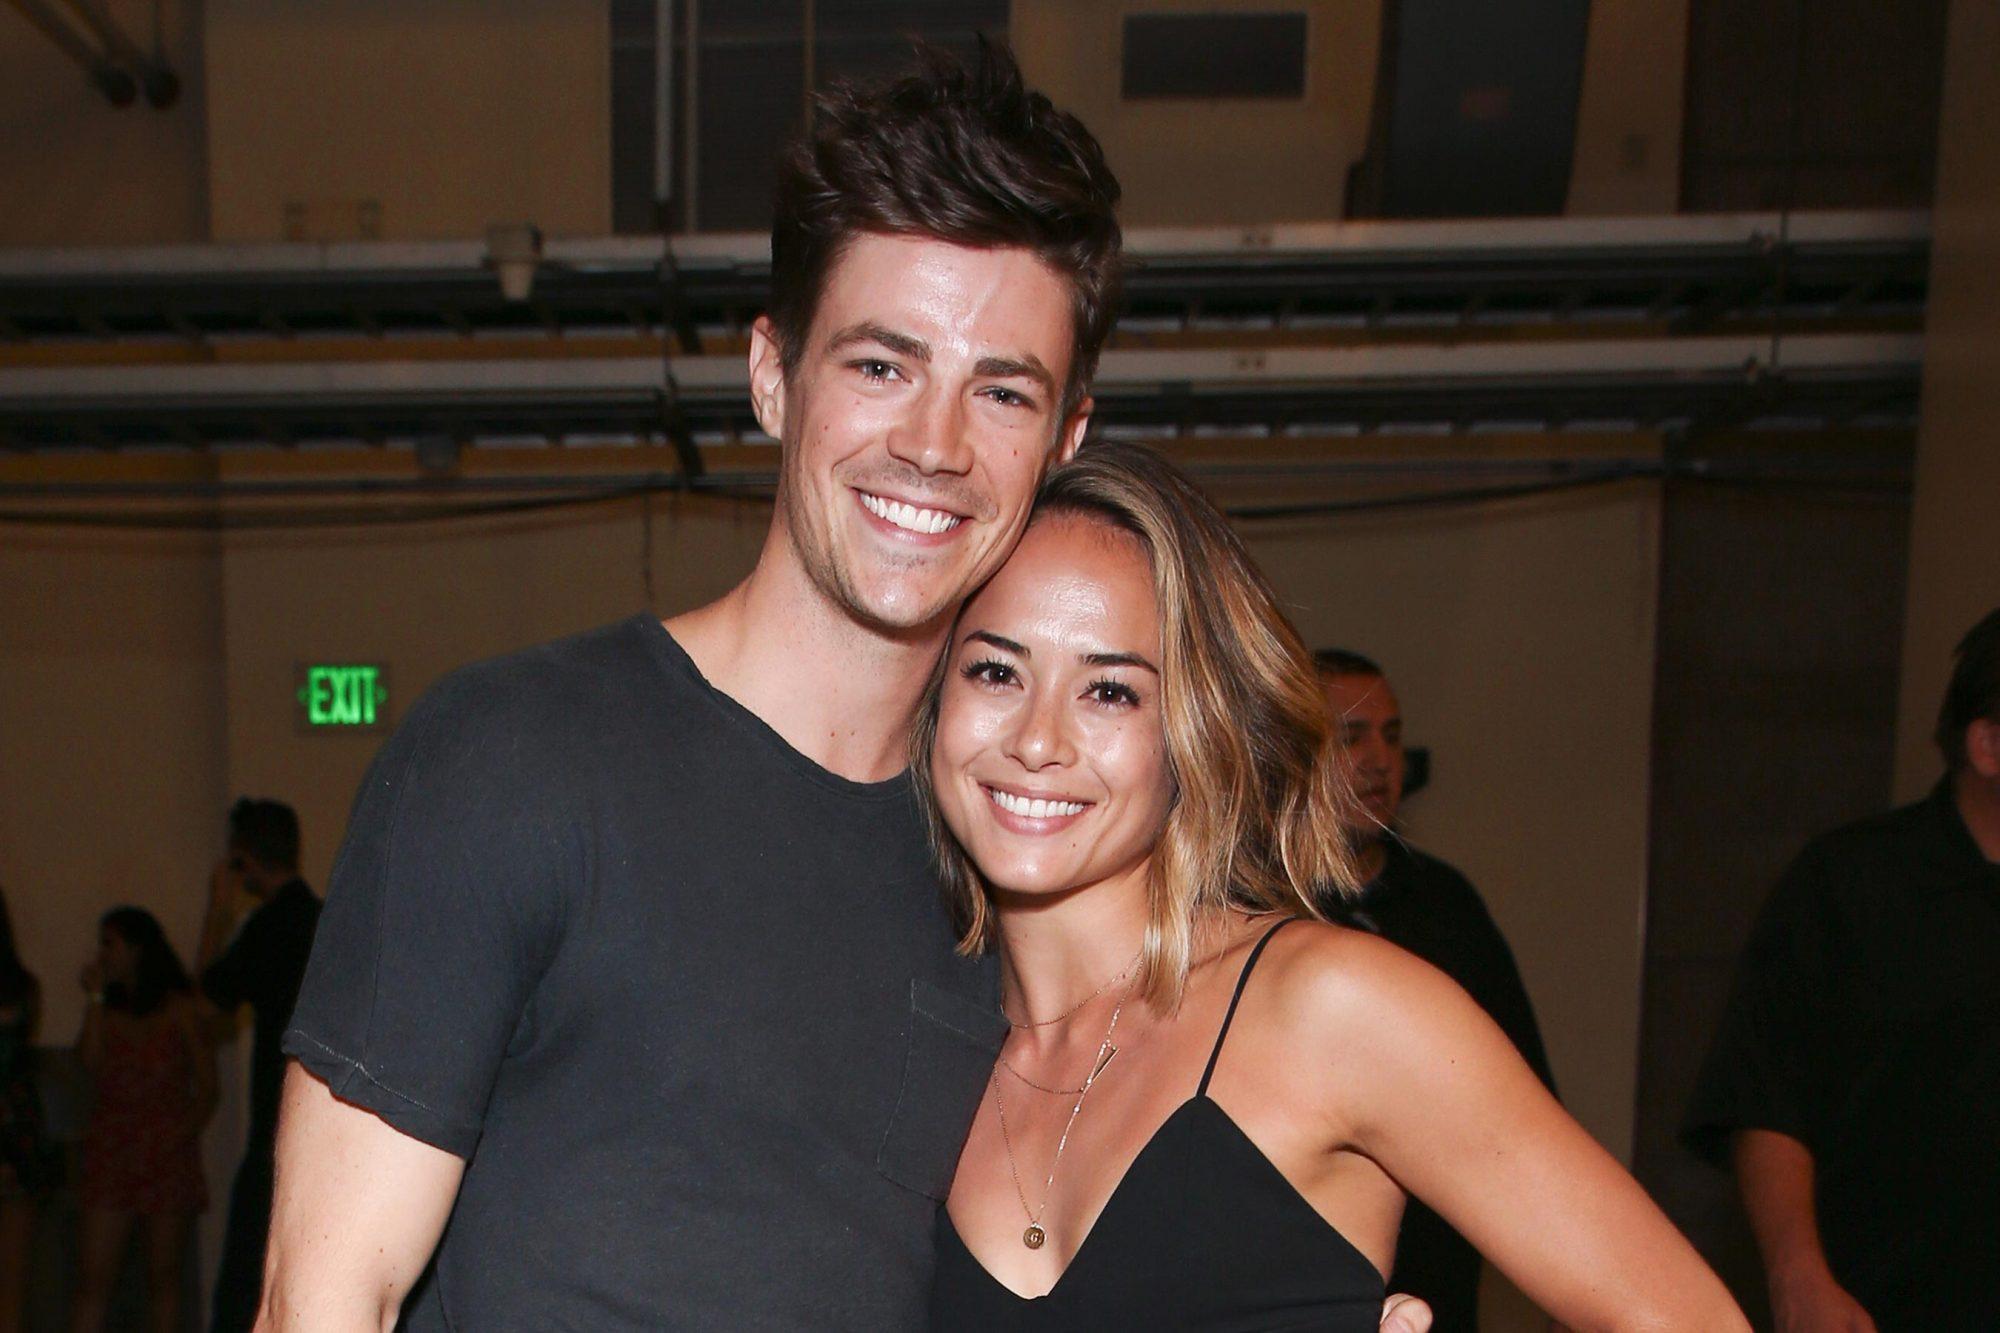 Teen Choice Awards, Backstage, Los Angeles, USA - 13 Aug 2017